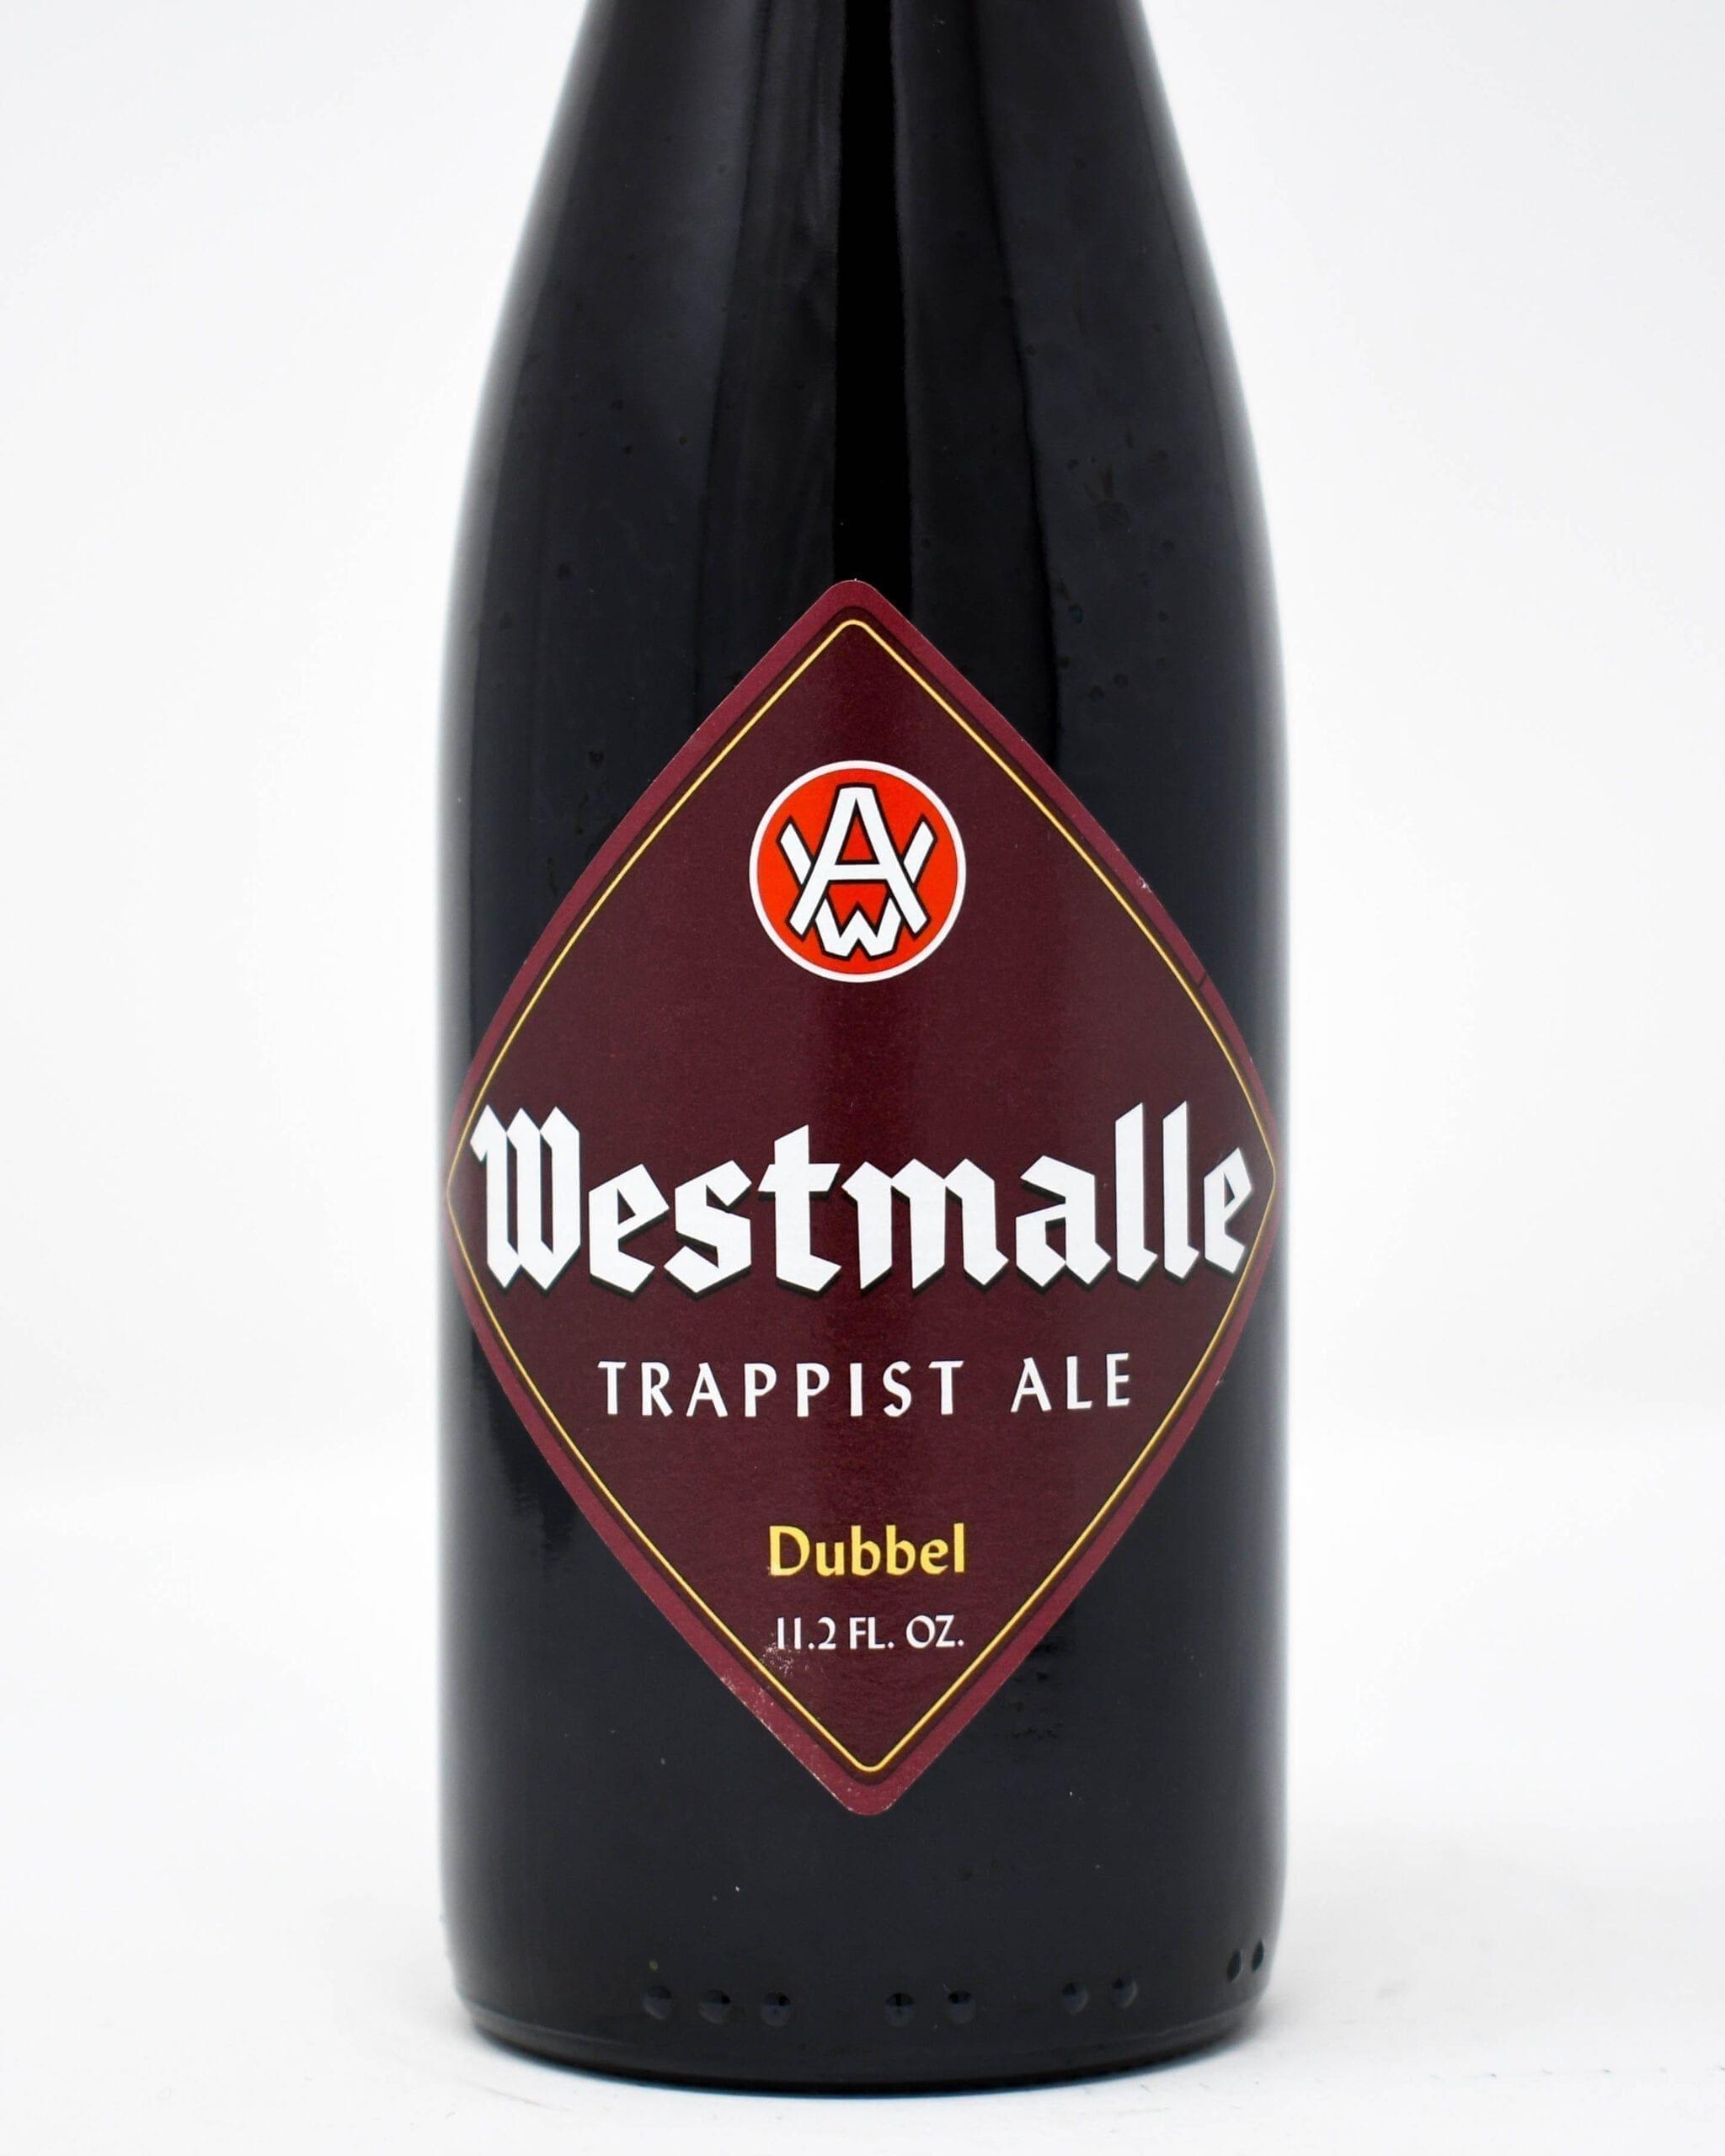 Westmalle Dubbel Trappist Ale